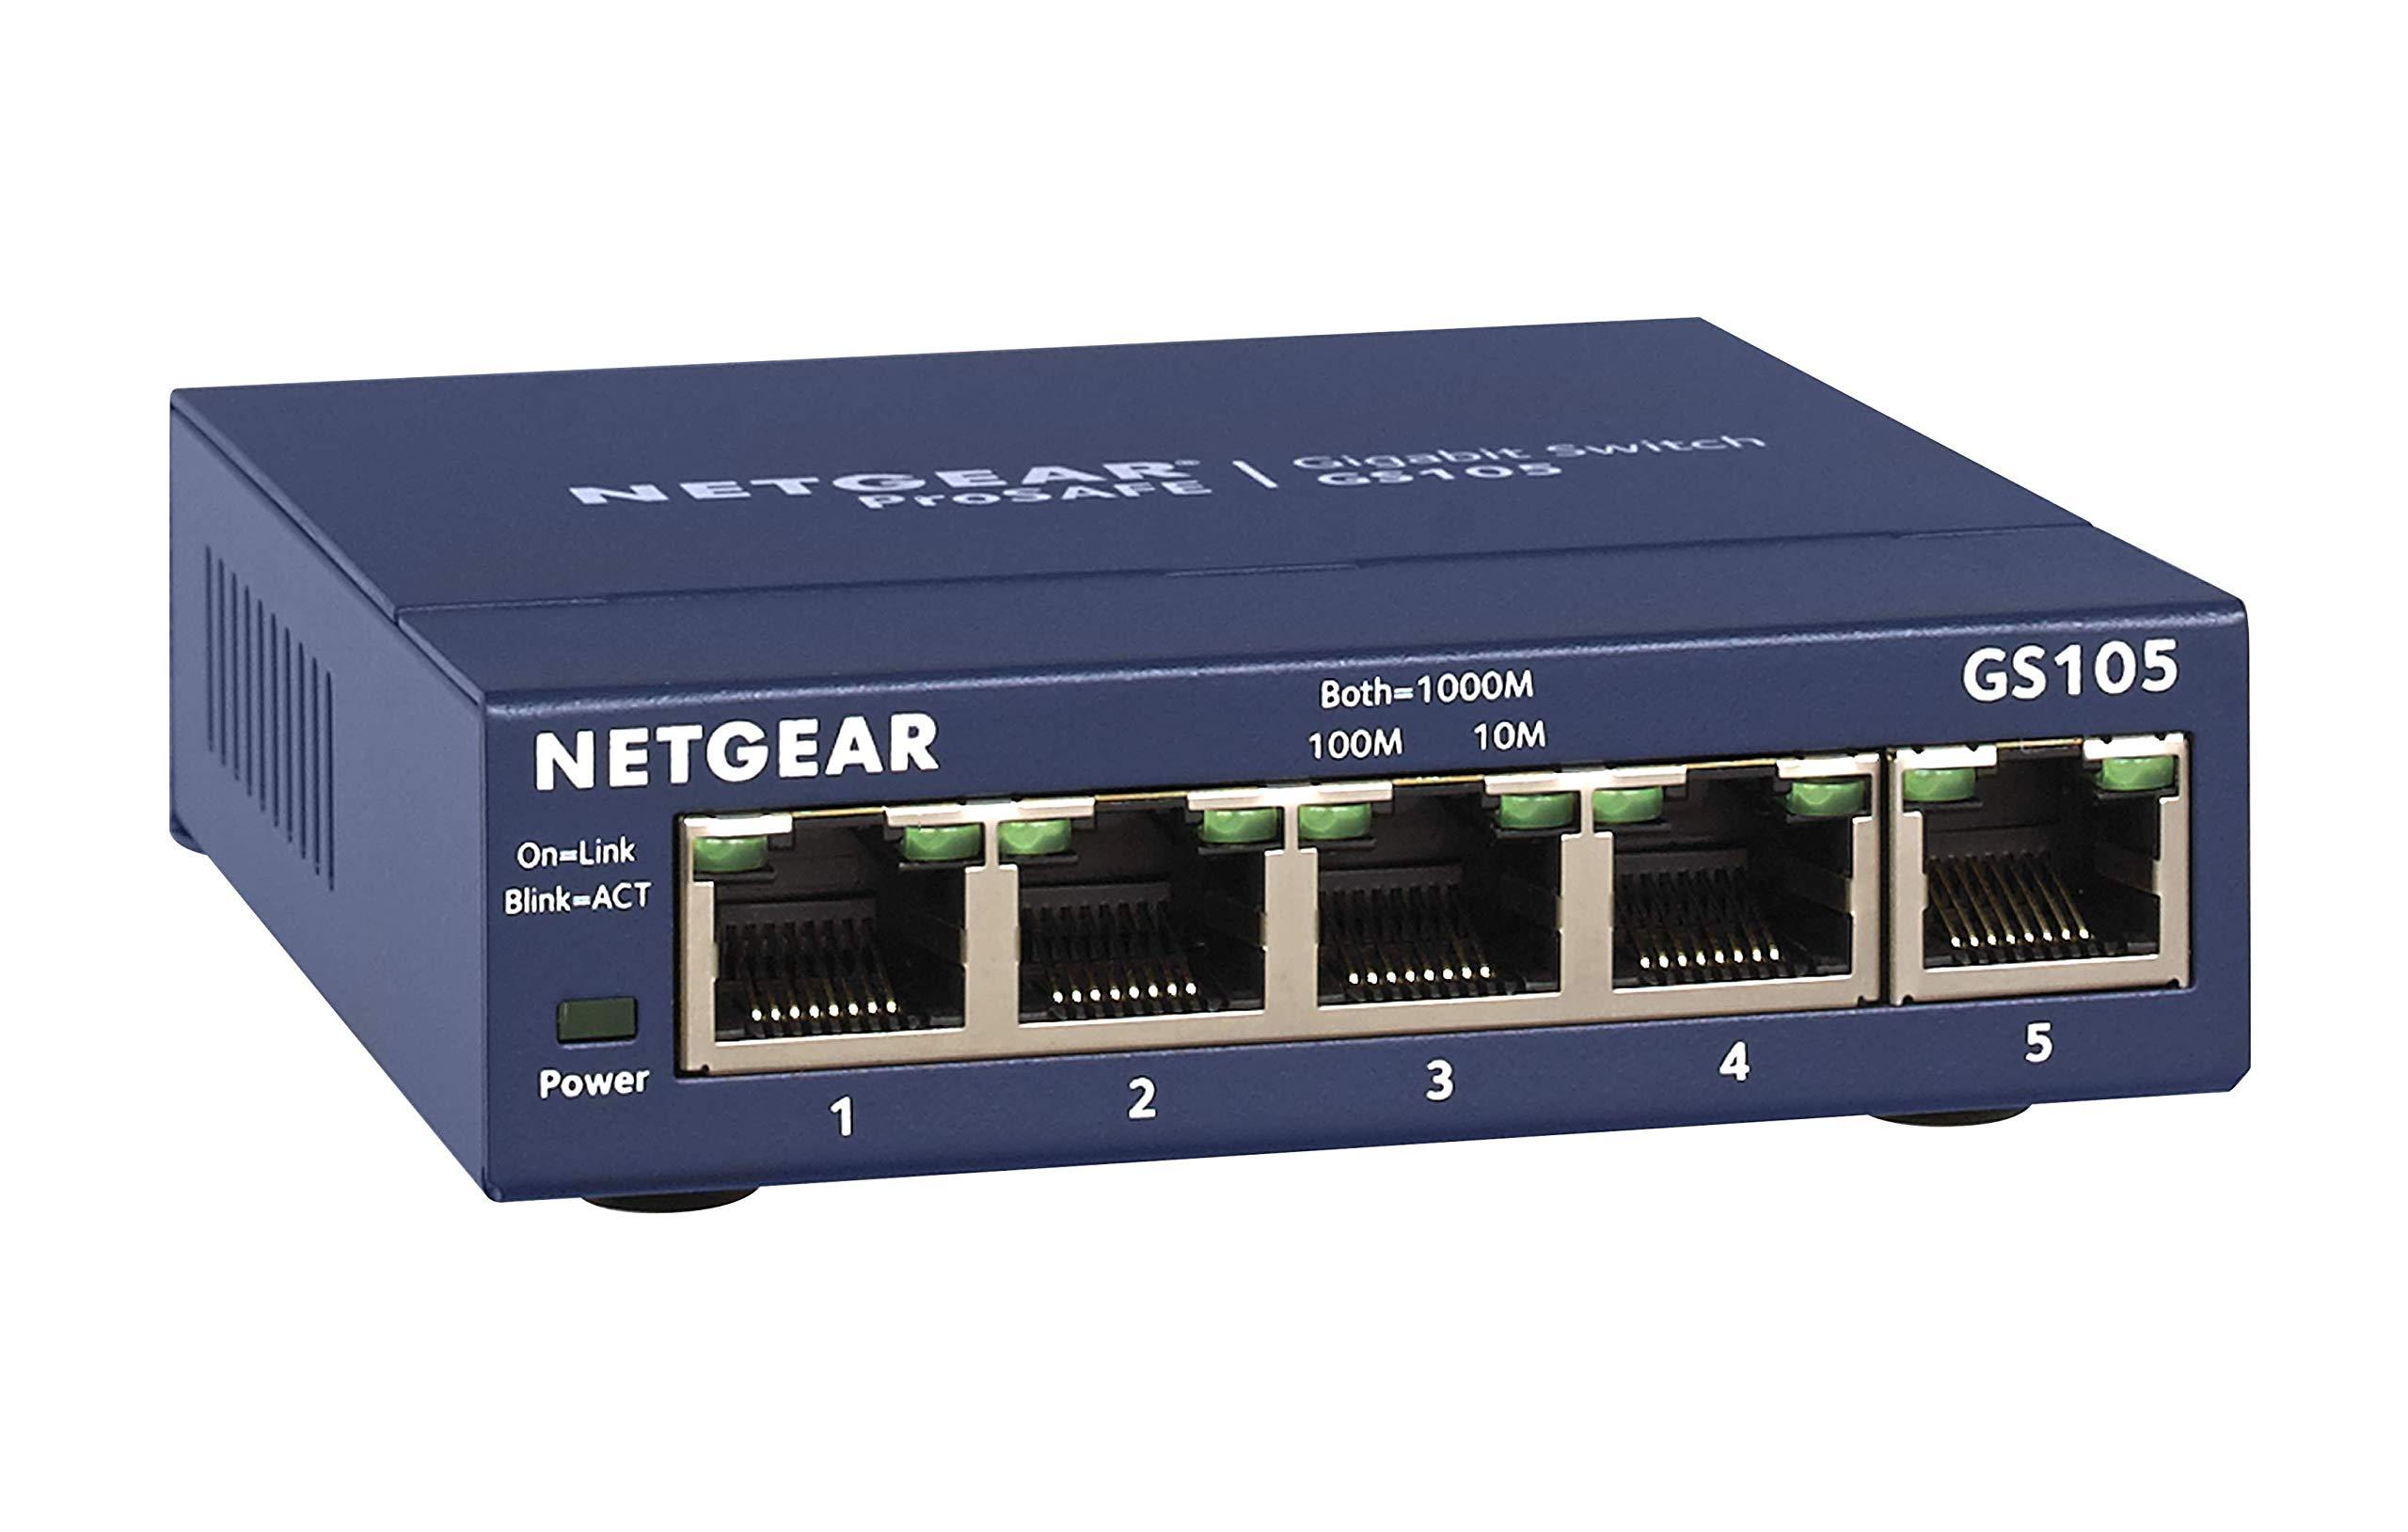 NETGEAR 5-Port Gigabit Ethernet Unmanaged Switch (GS105NA) - Desktop, and ProSAFE Limited Lifetime Protection by NETGEAR